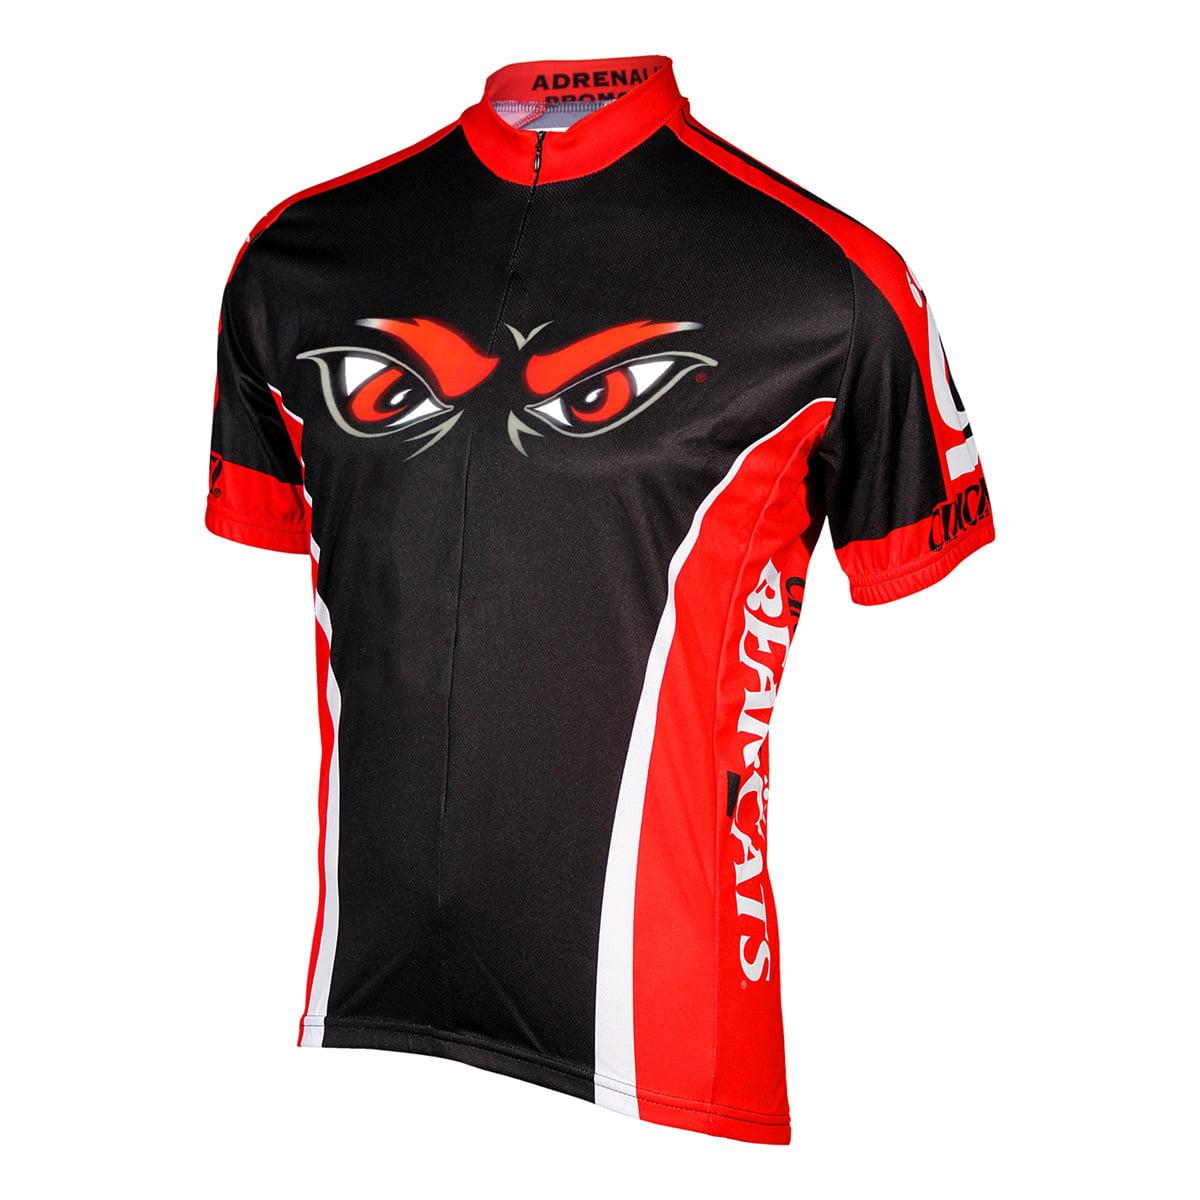 Adrenaline Promotions University of Cincinnati Bearcats Cycling Jersey